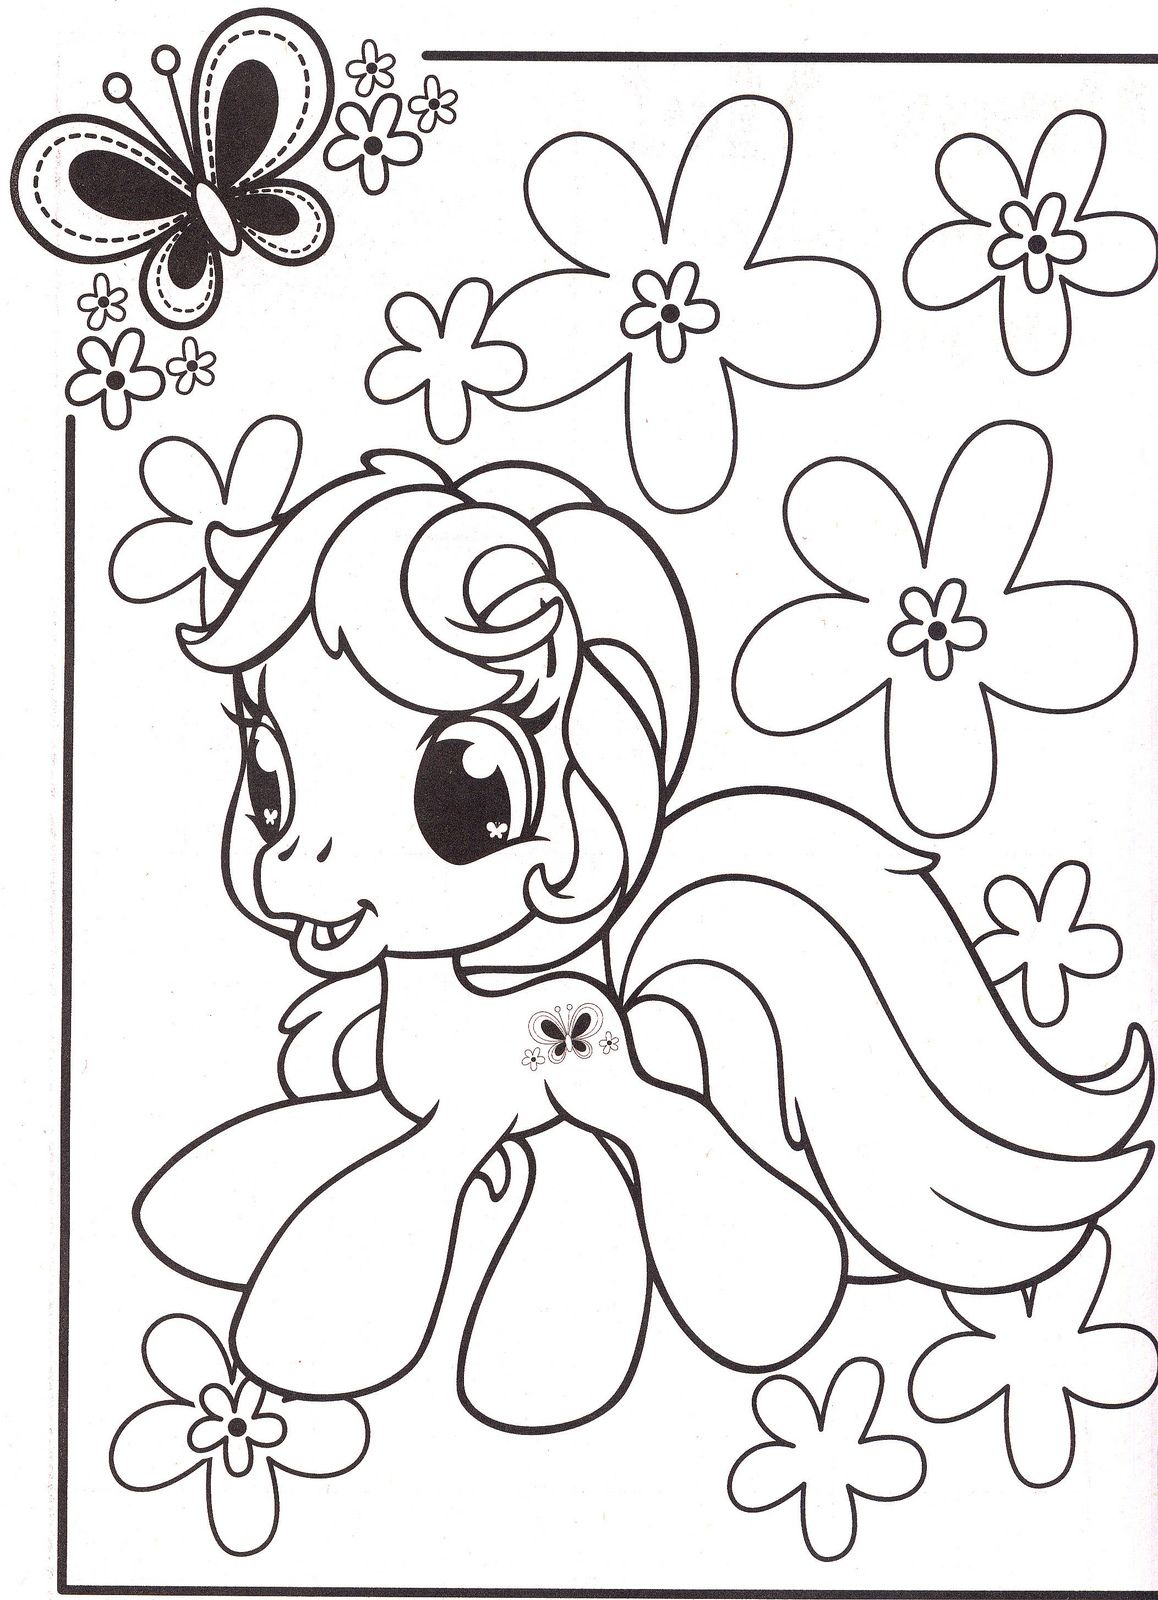 My Little Pony Coloring Pages 46 Ausmalbilder Ausmalbilder Kinder